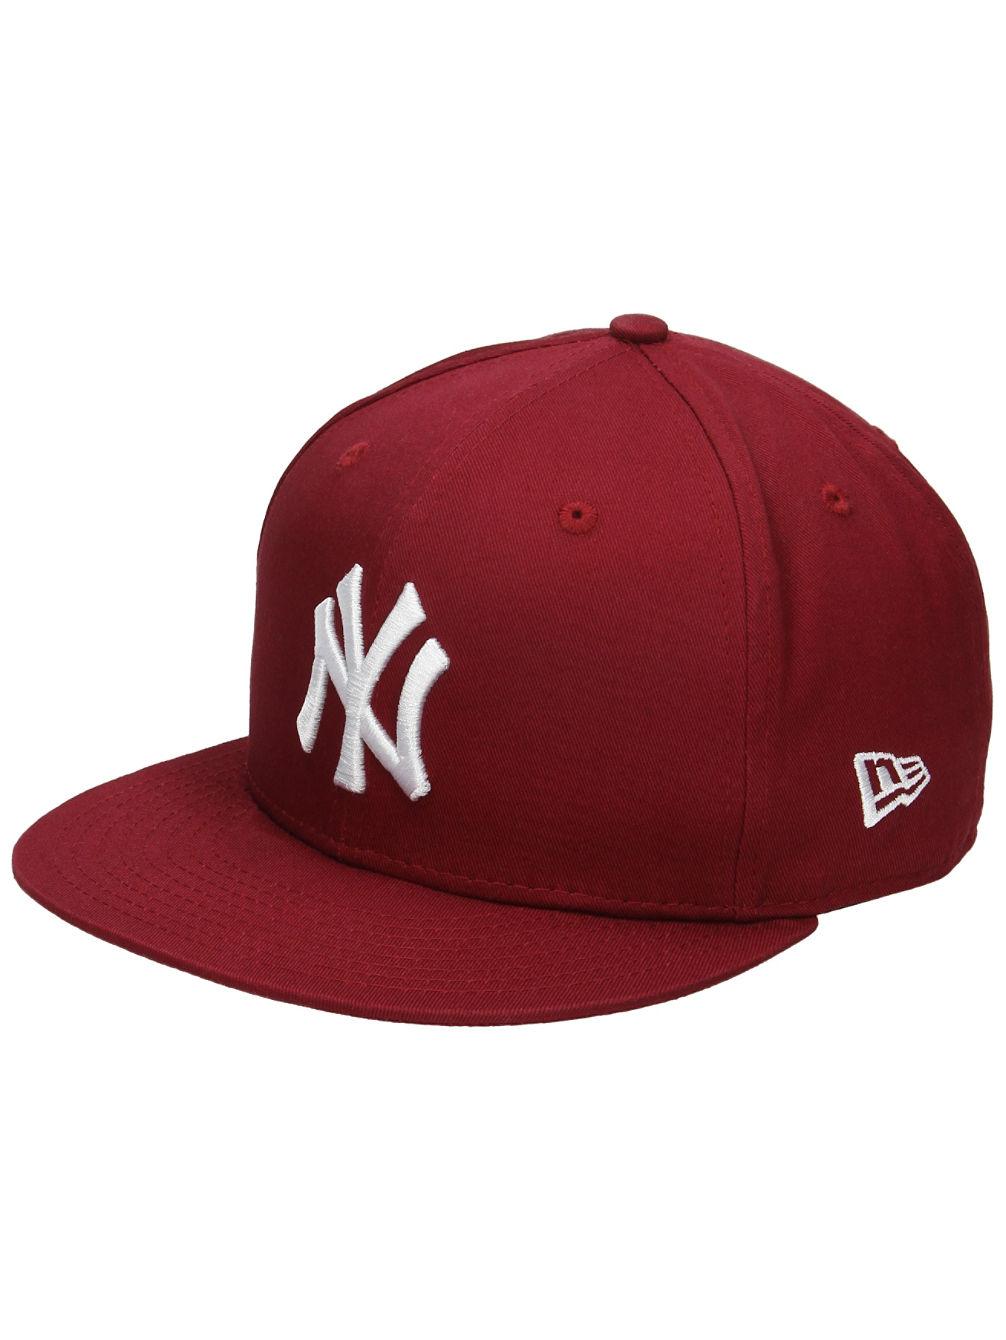 Buy New Era MLB League Essential 950 Cap online at blue-tomato.com 2f38e942c15